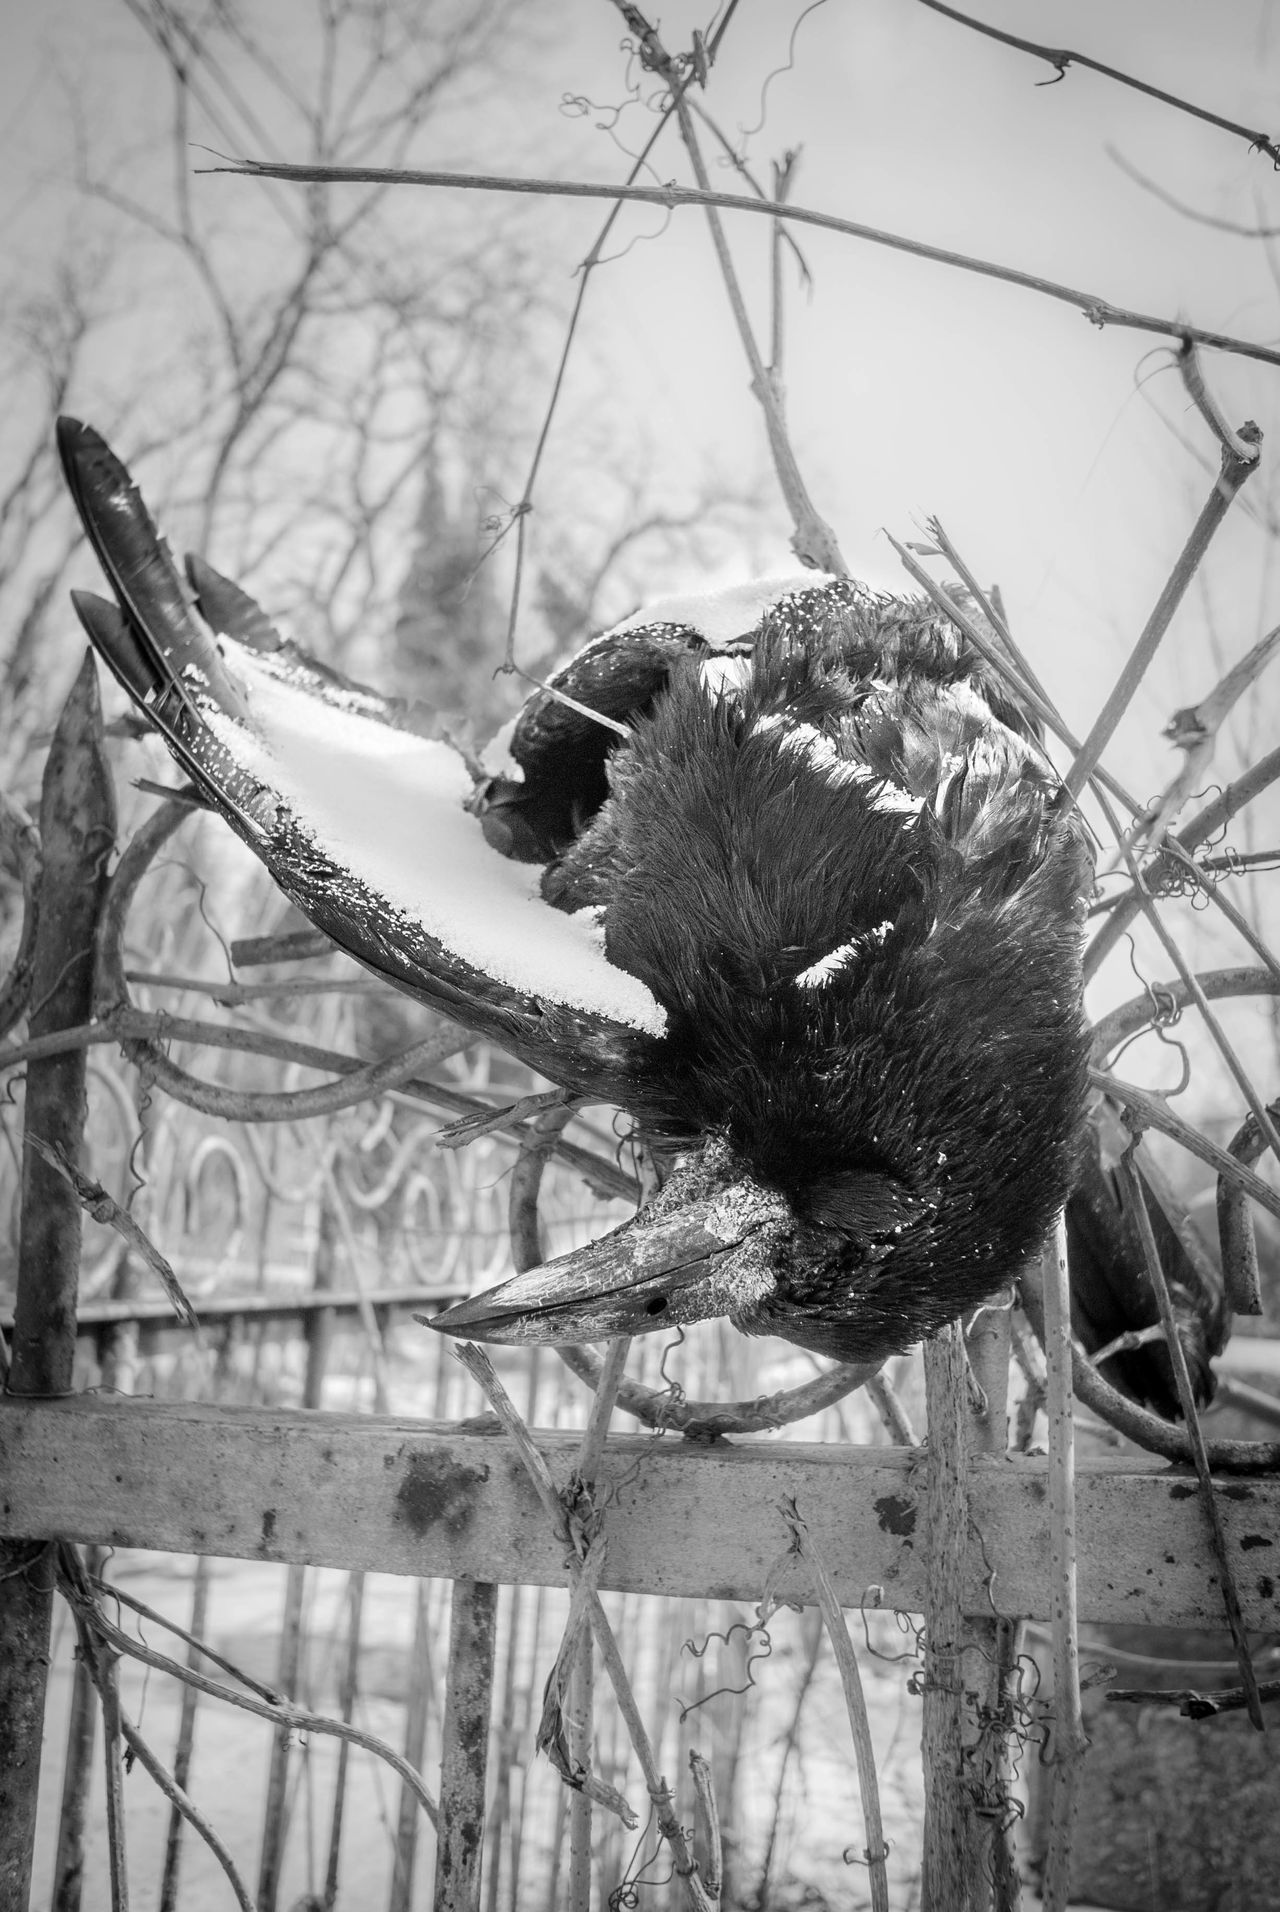 Animal Themes Bird Cemetery Covered In Snow Day Dead Edgar Allan Poe Edgarallanpoe Flight Discontinued Morbid Nature No People One Animal Outdoors Poe Poetry Rain Raven Sand Sky Stuck Tragic